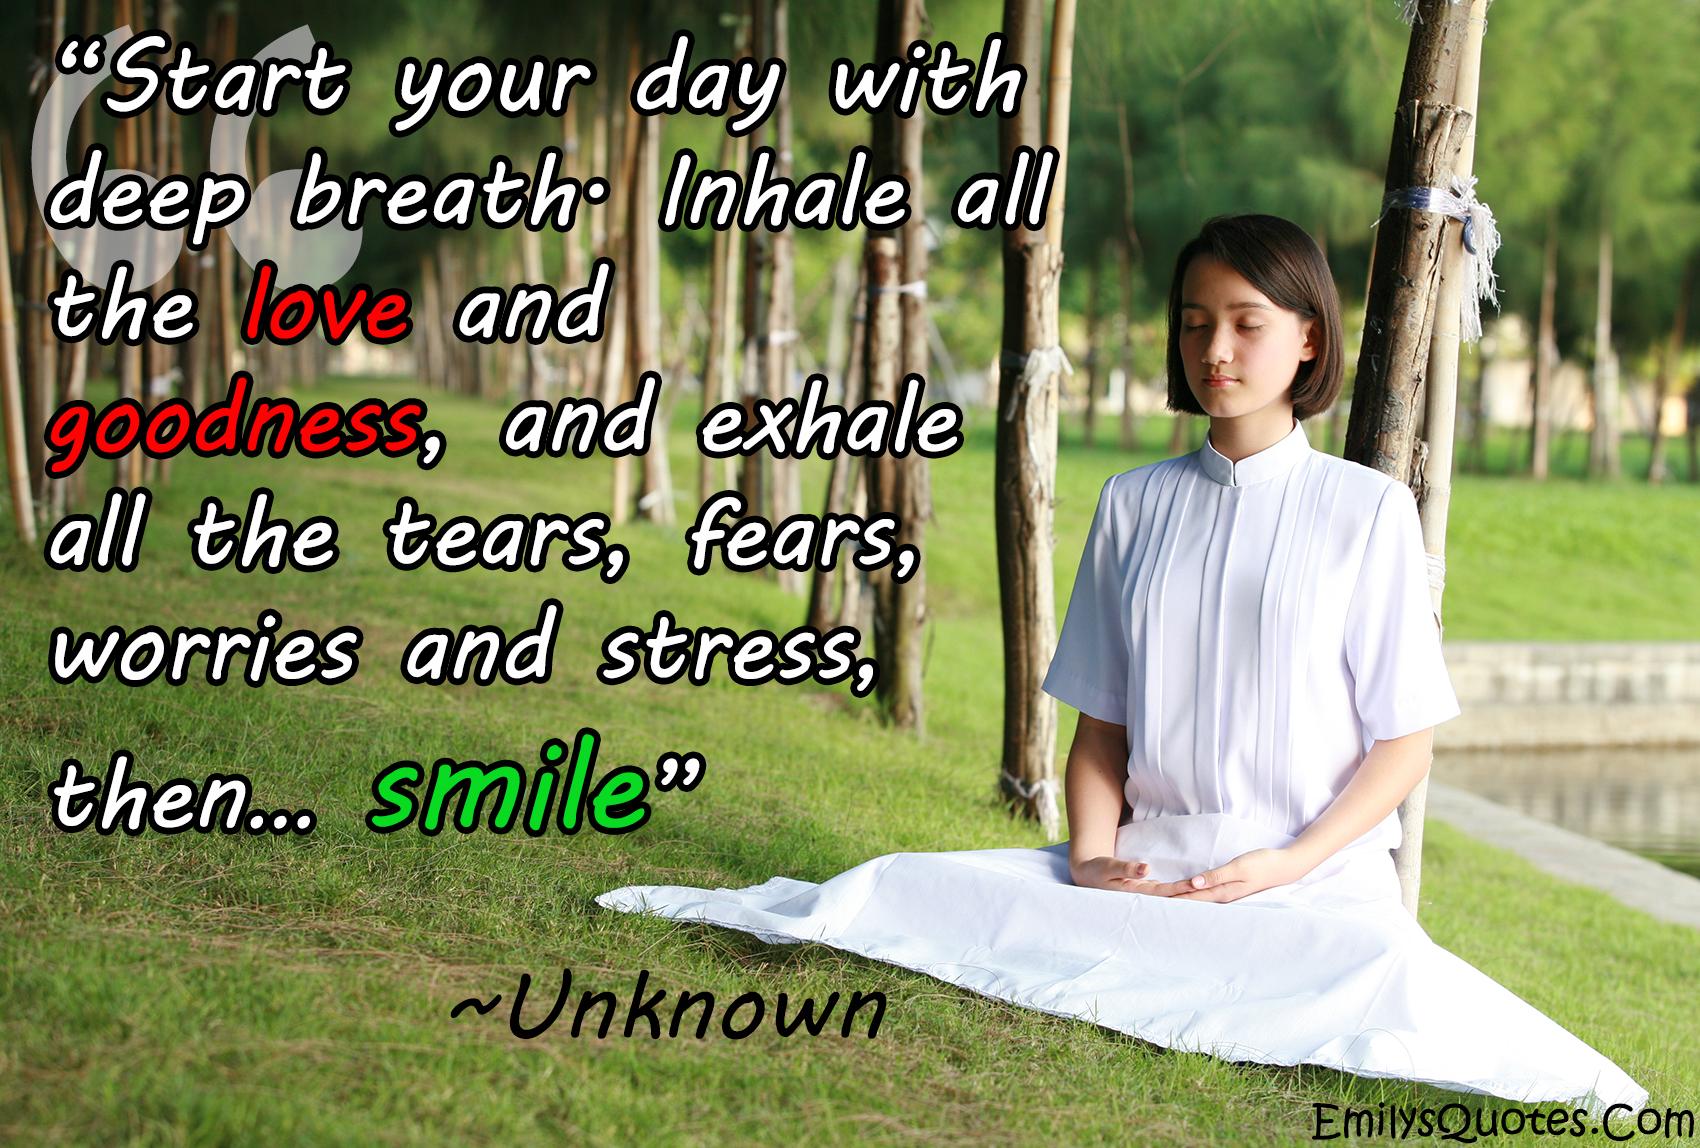 EmilysQuotes.Com - positive, great, peace, love, smile, unknown